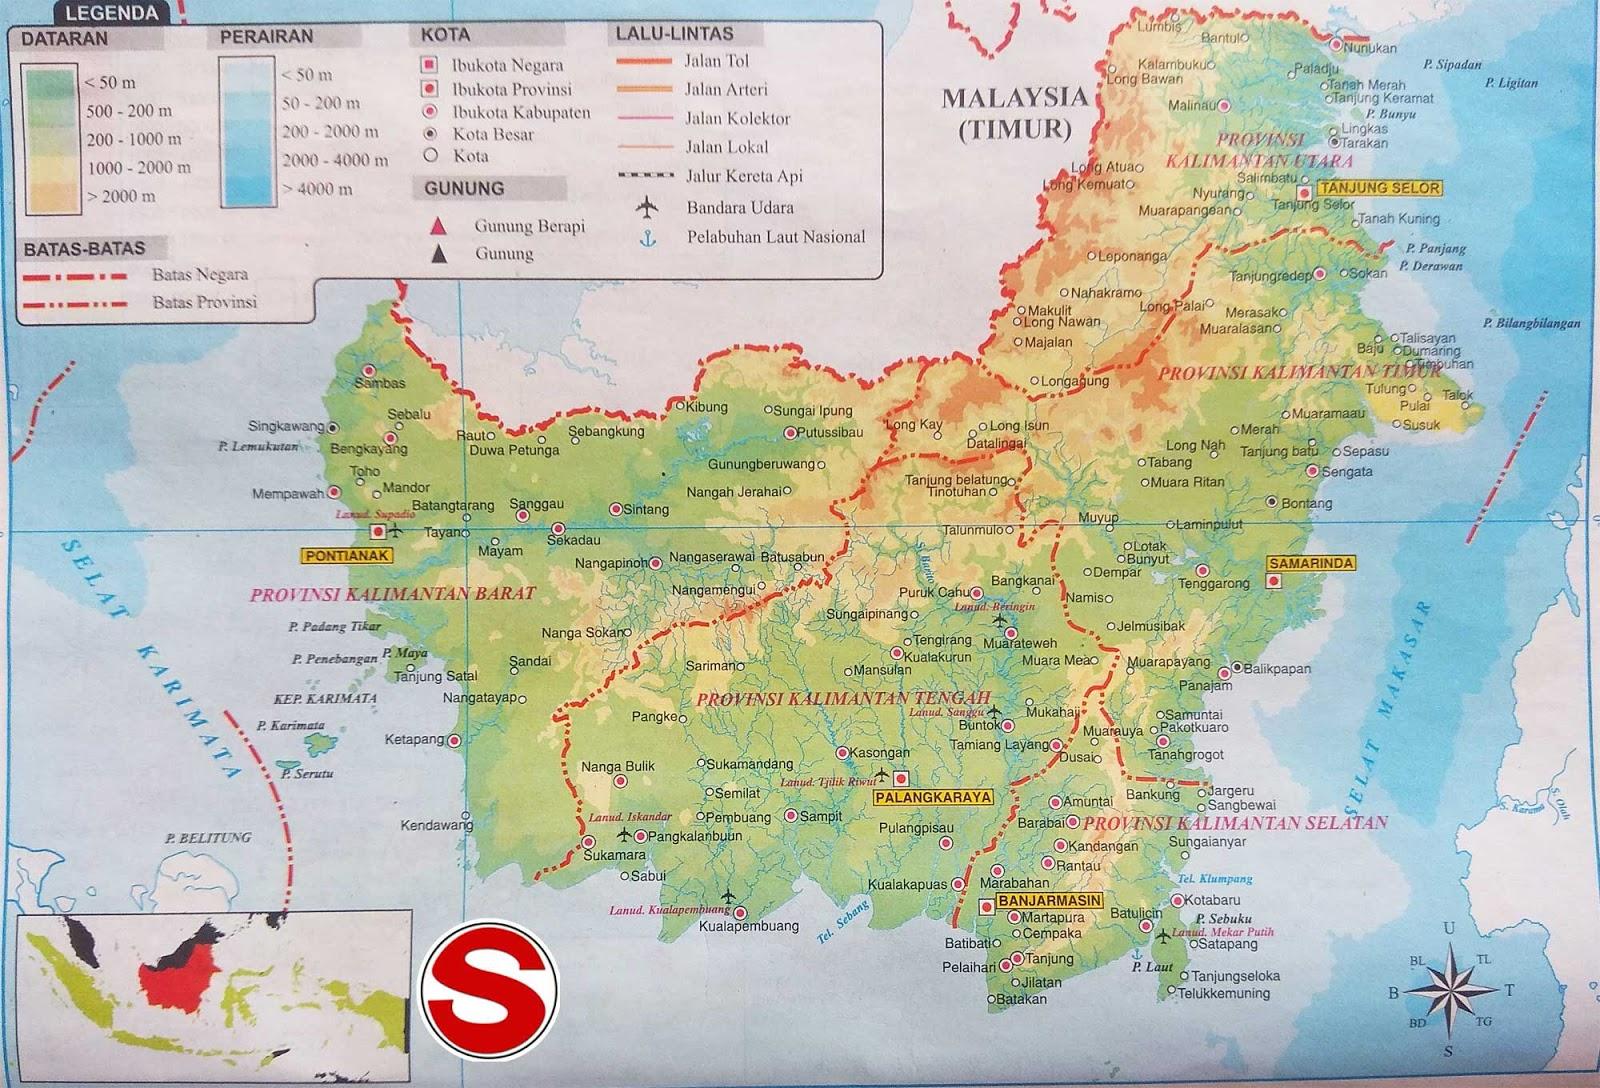 Download Gambar Sketsa Pulau Kalimantan Sketsa Gambar